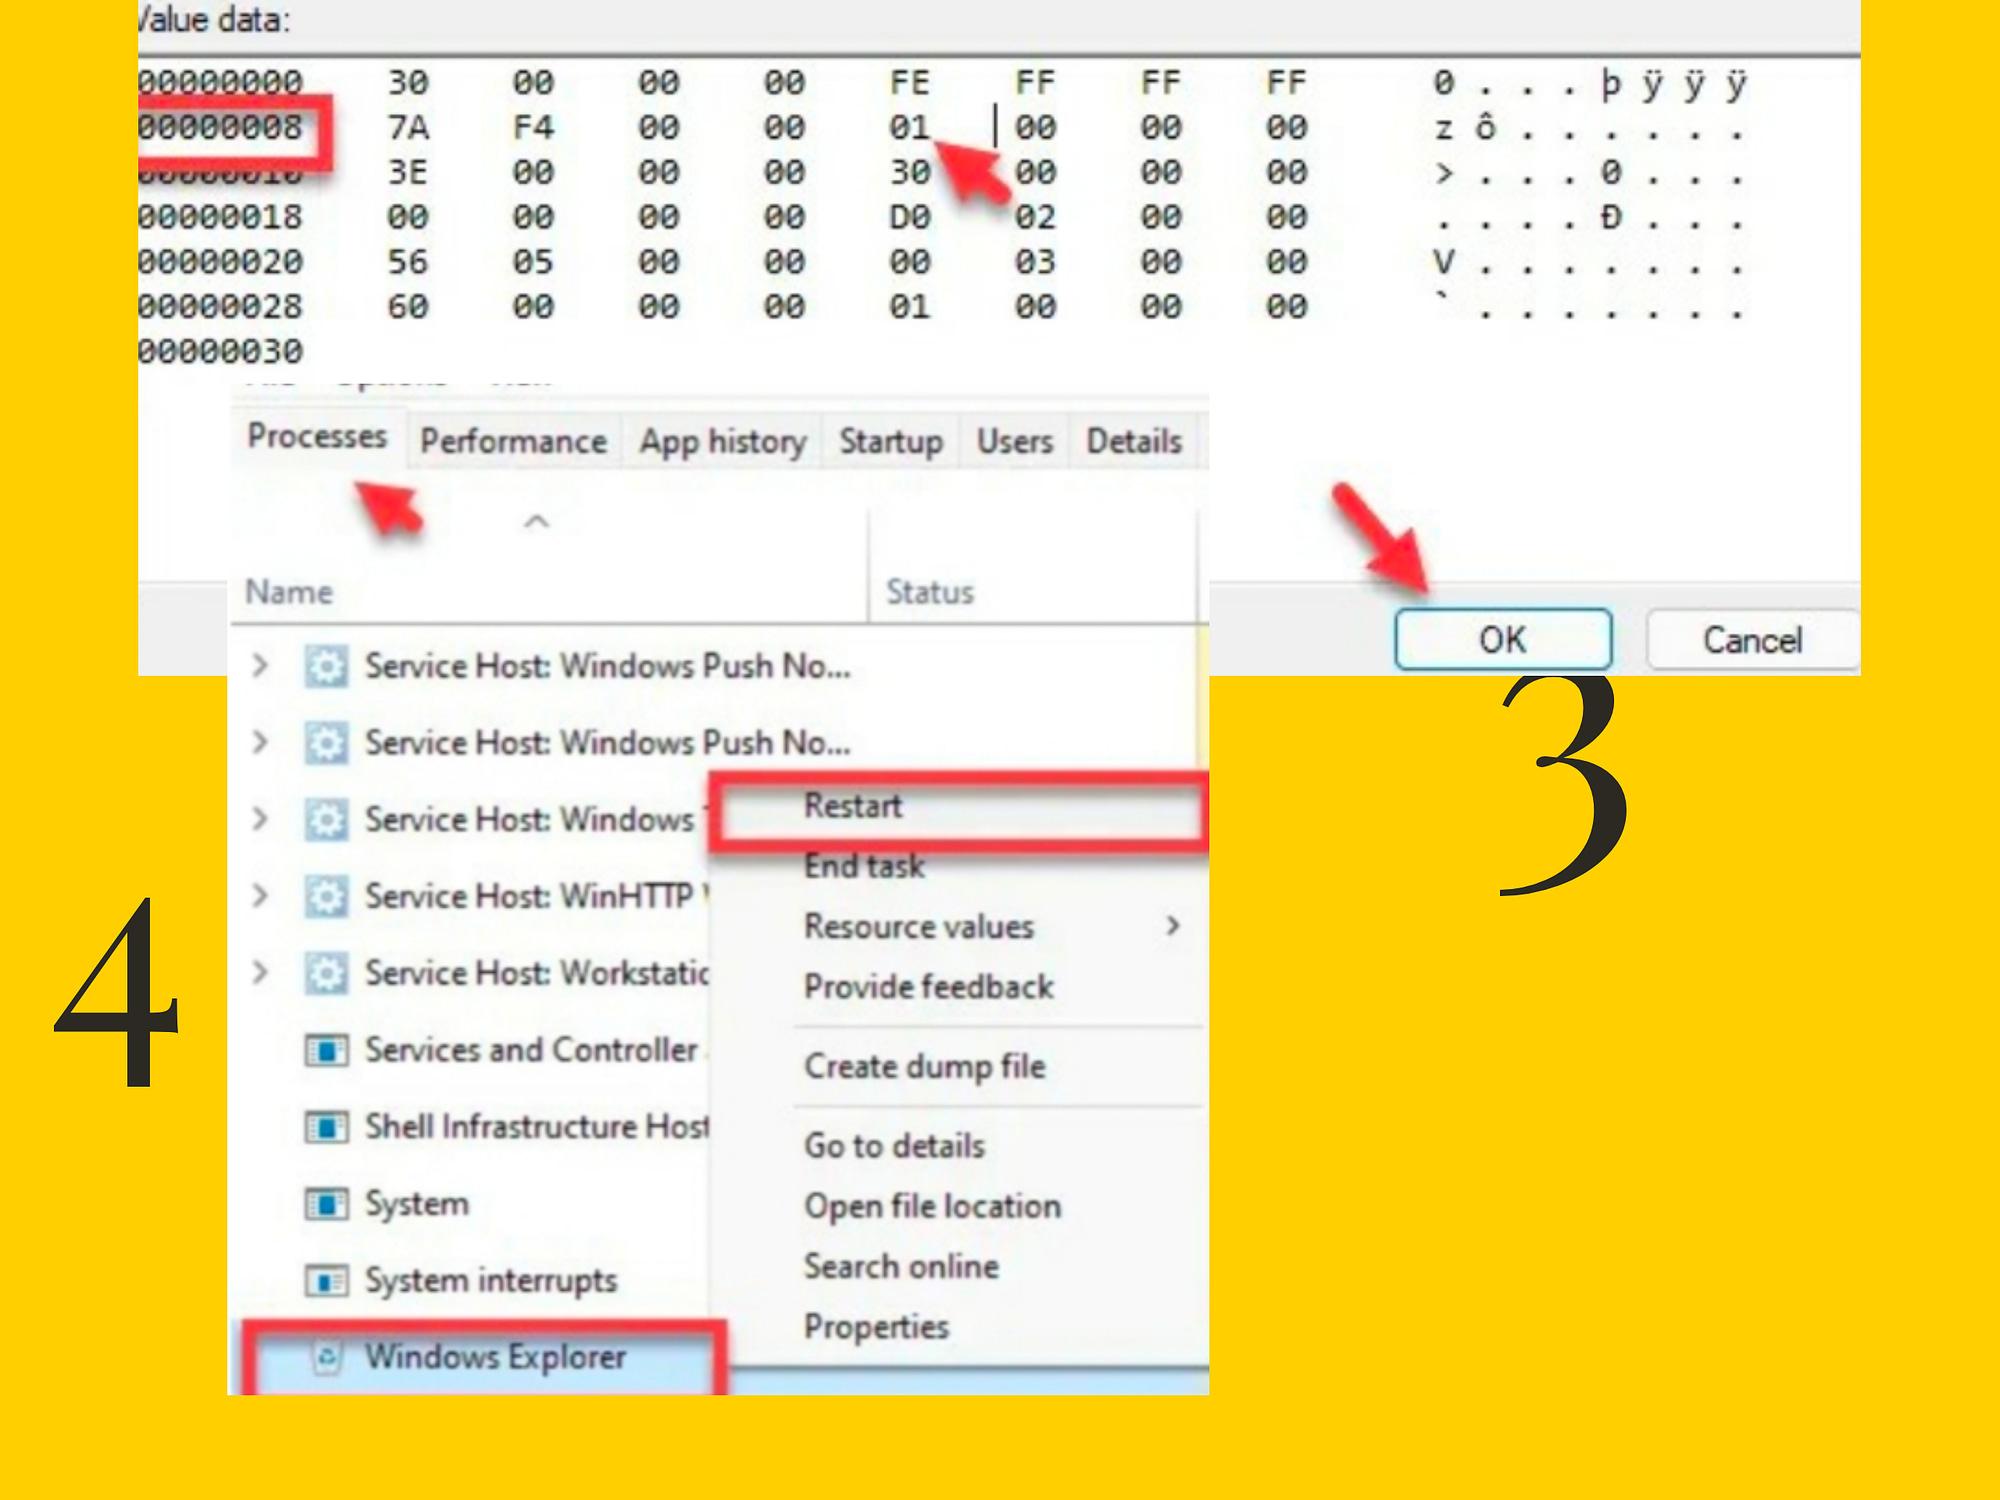 Adobe Post 20210804 0046560.4243073267739429 put Taskbar on the top of your Screen on Windows 11 pc